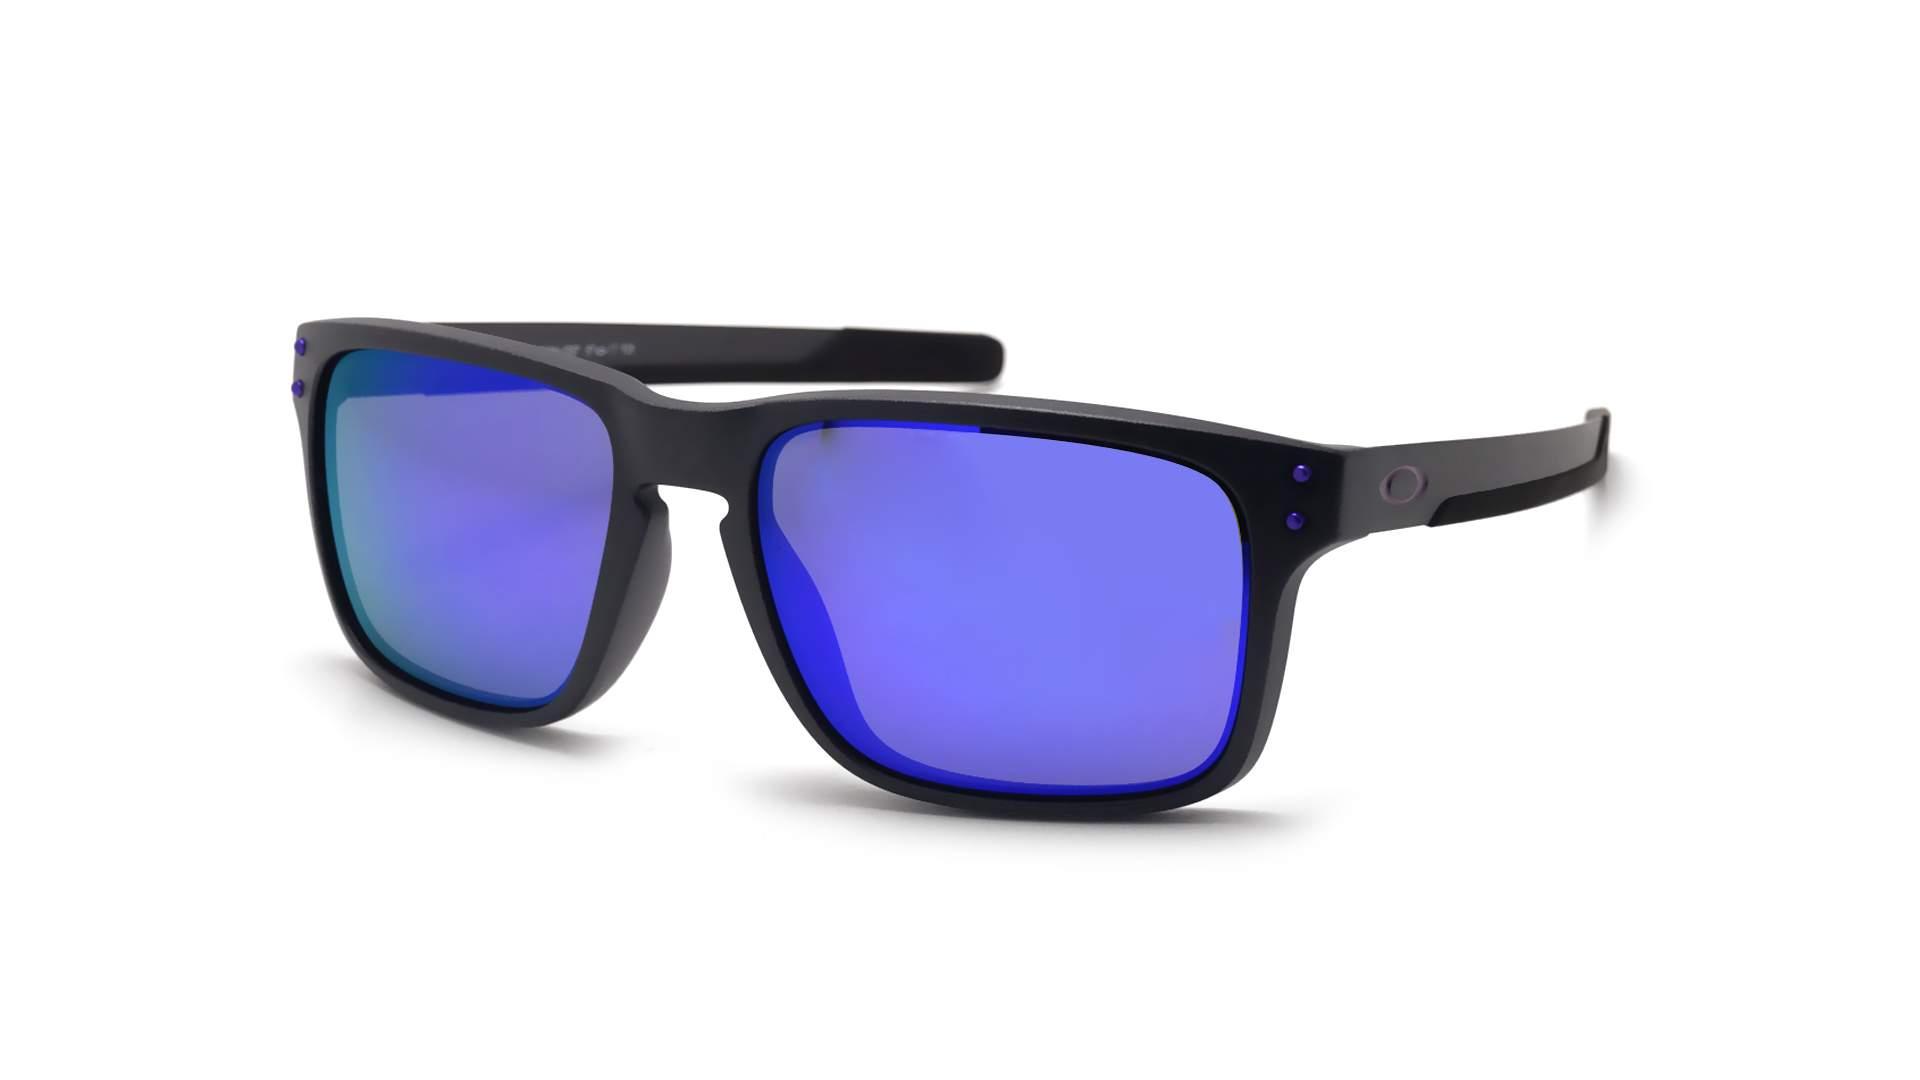 c0056de5a5 Sunglasses Oakley Holbrook Mix Grey Matte OO9384 02 57-17 Large